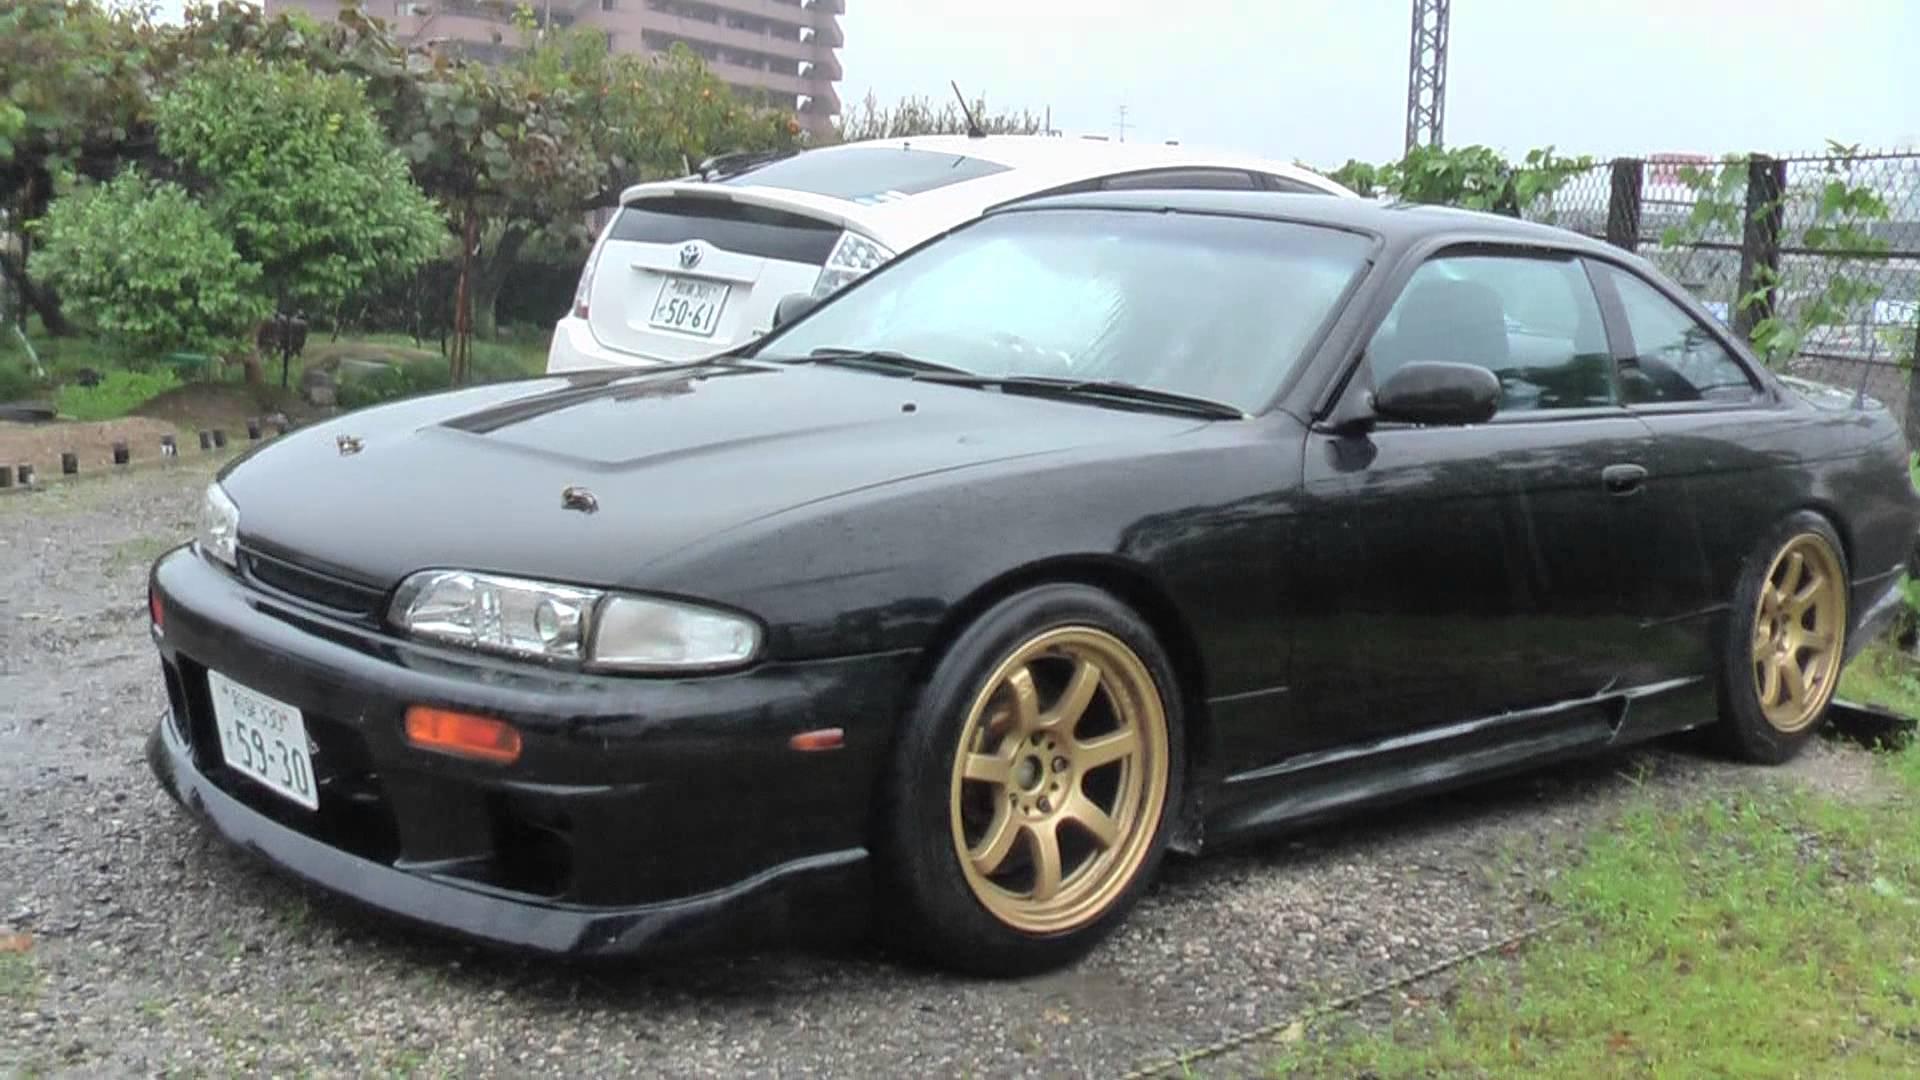 Nissan Silvia VI (S14) 1993 - 1998 Coupe #6